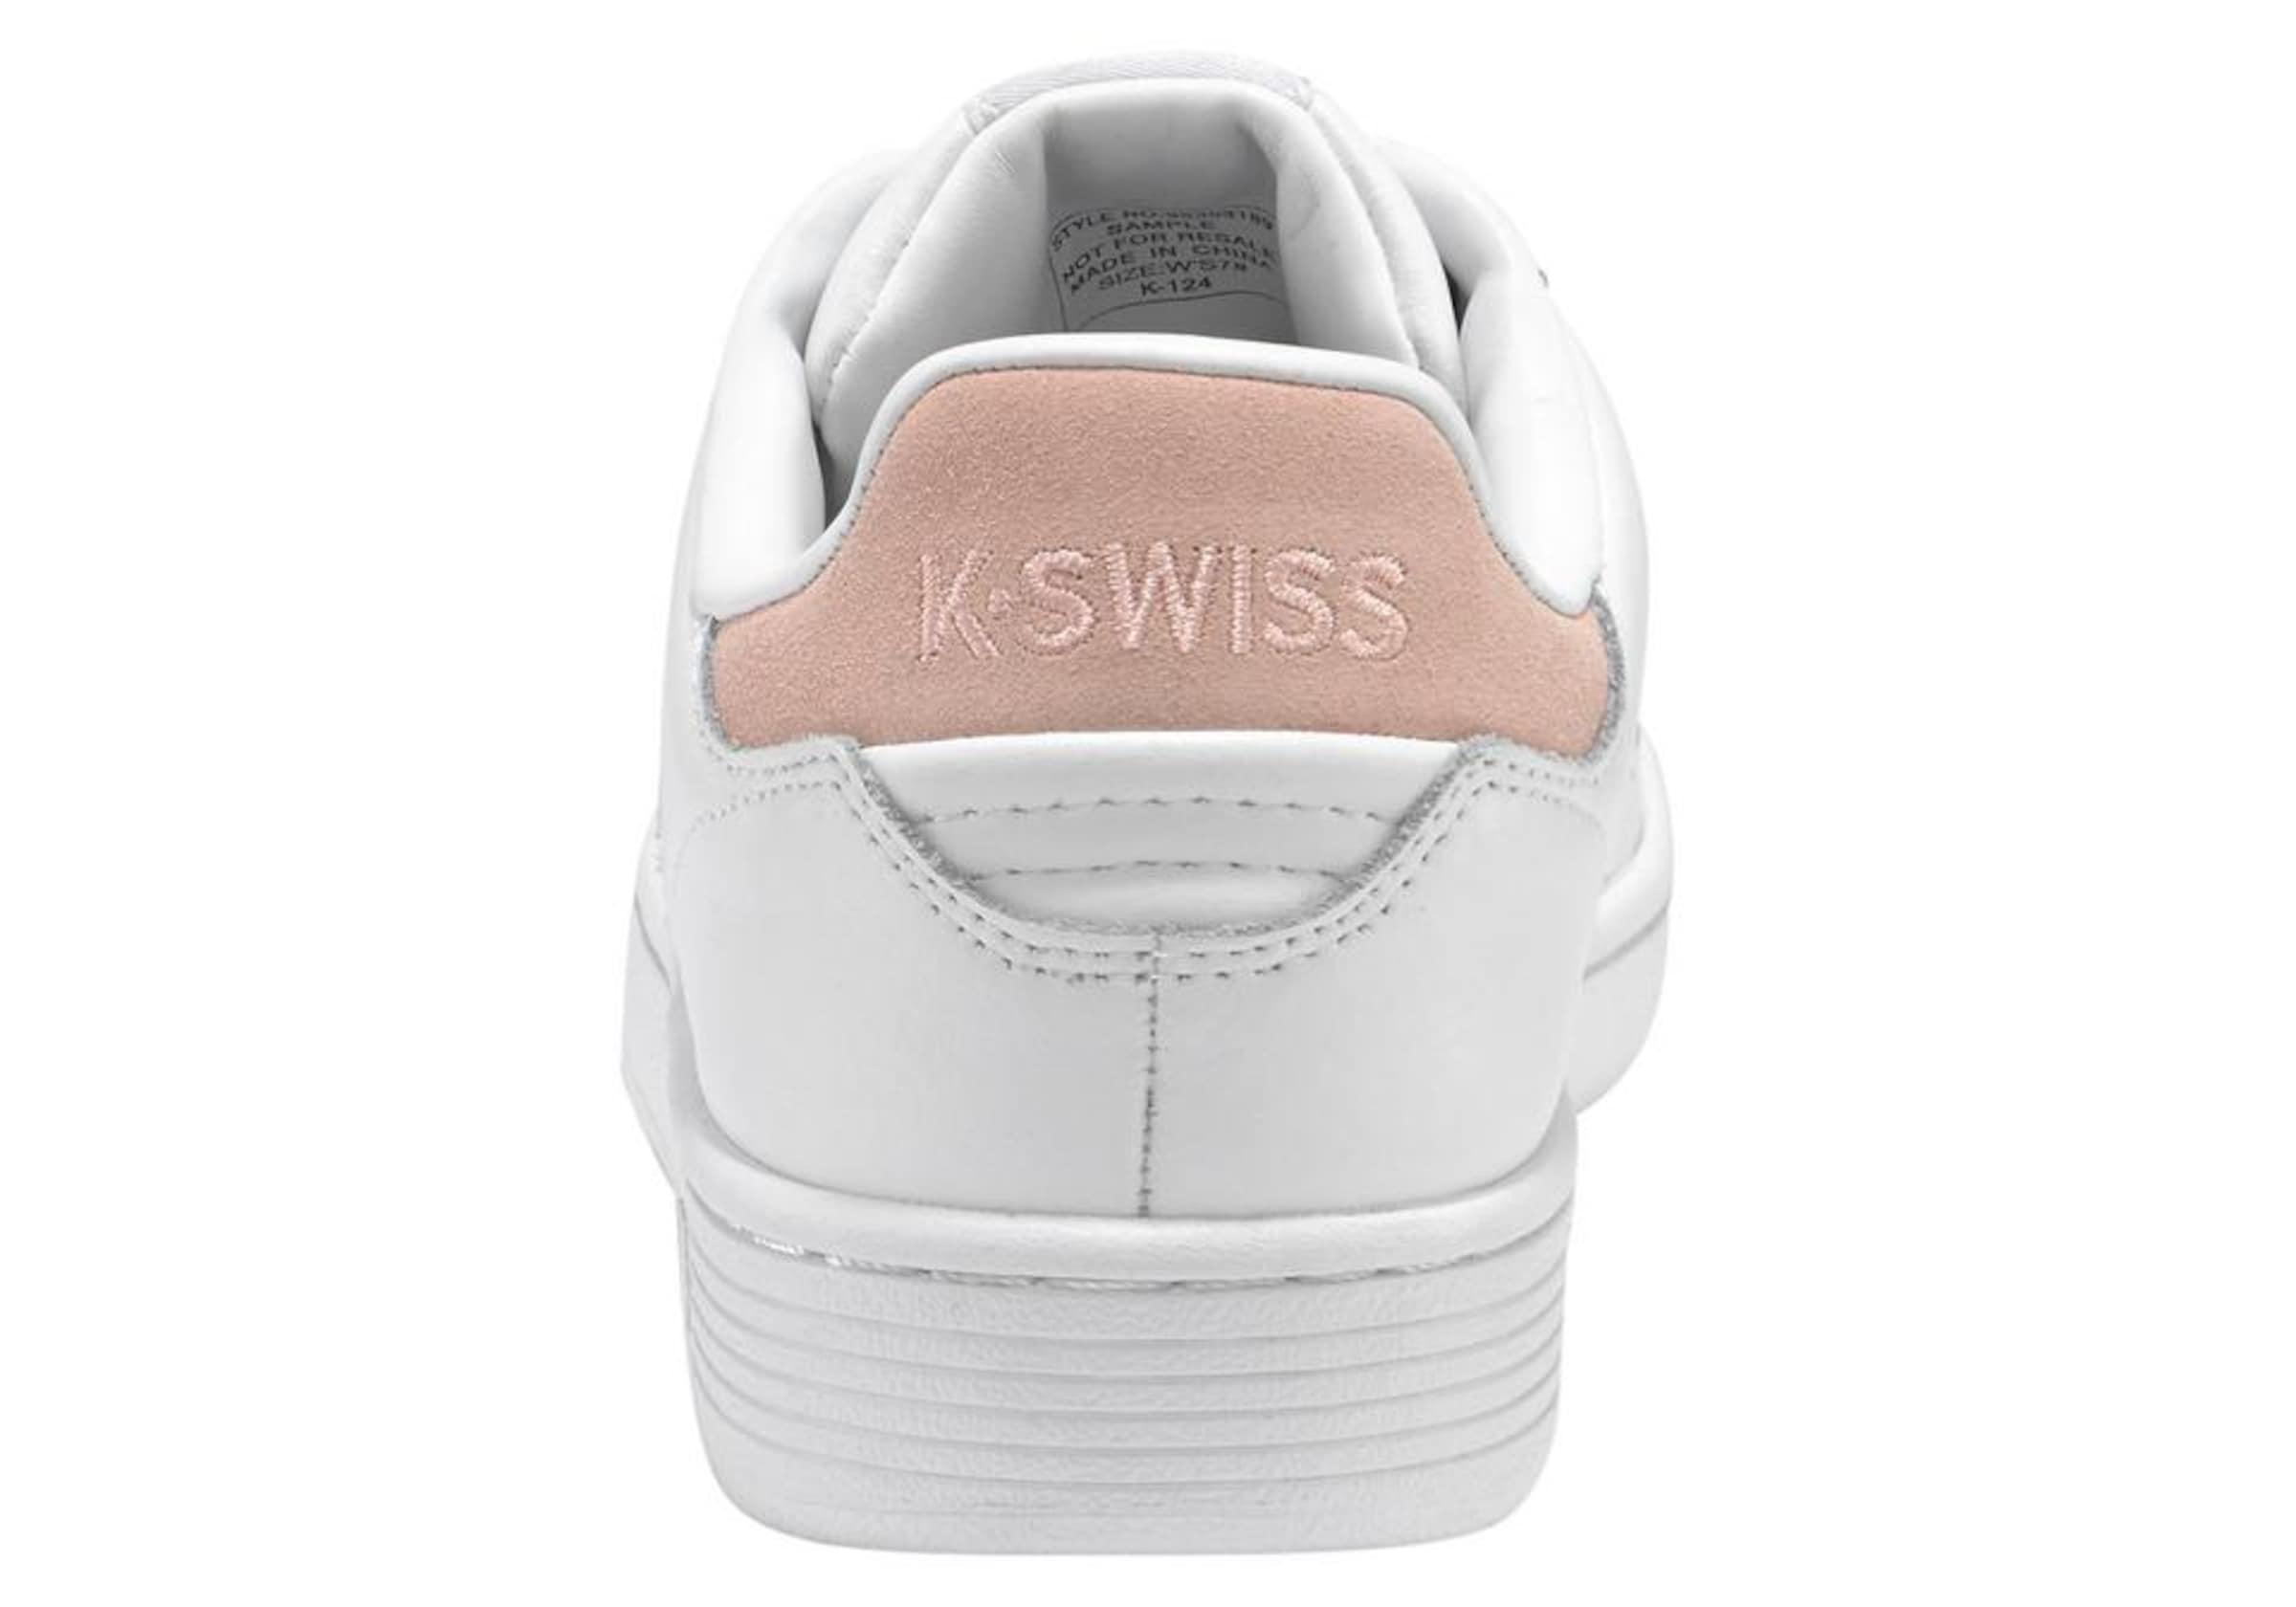 K-SWISS Leder Turnschuhe 'Clean Court CMF Leder K-SWISS Markenrabatt 7ddb6a